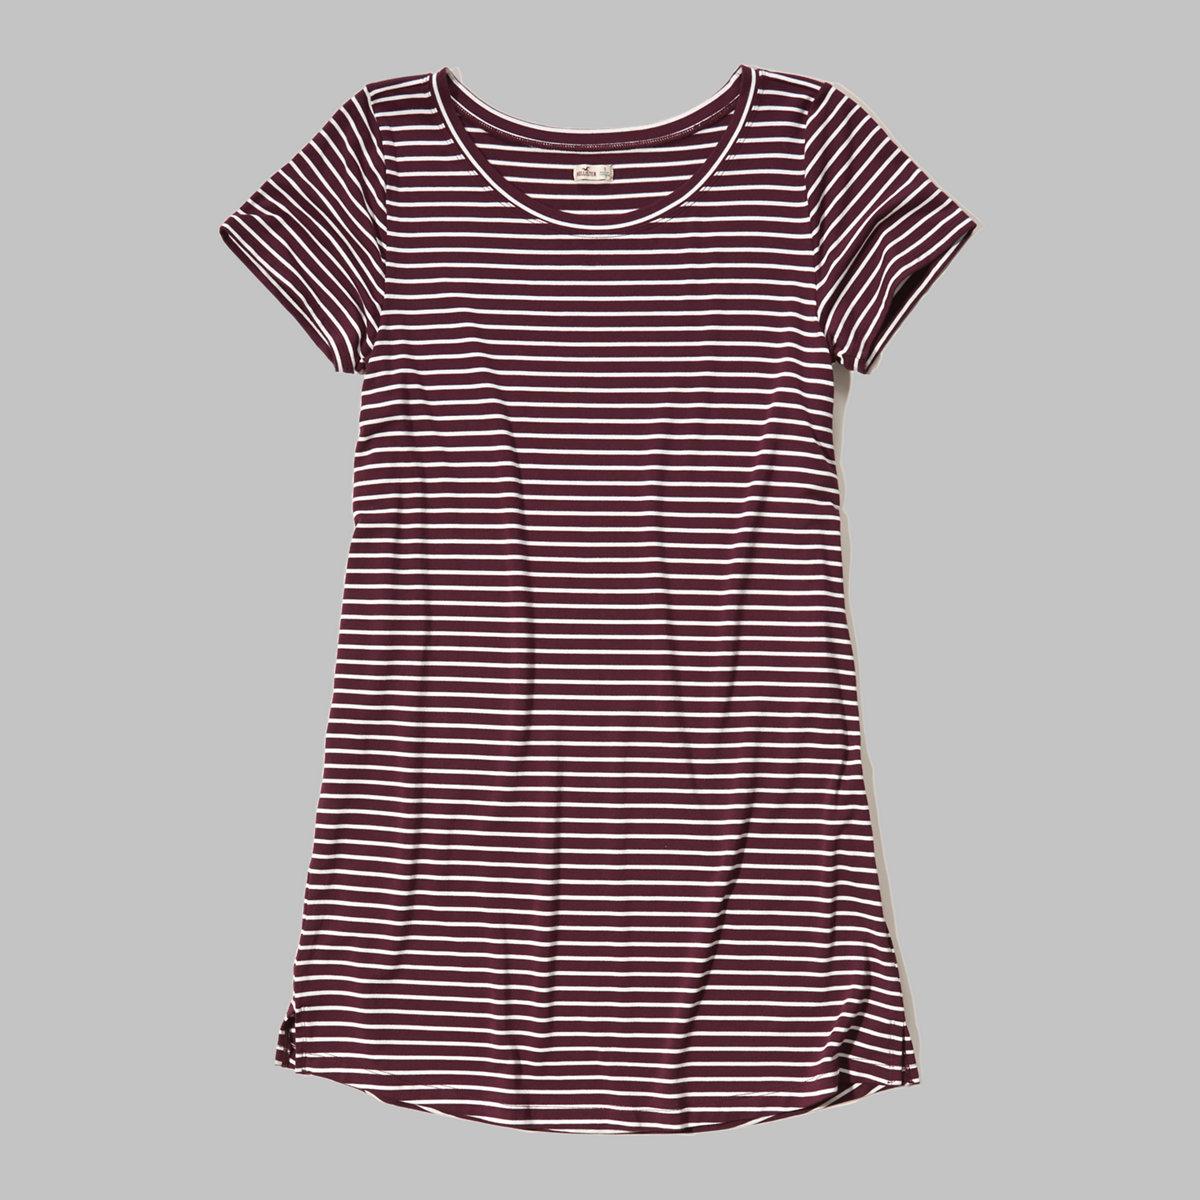 Knit T-Shirt Dress